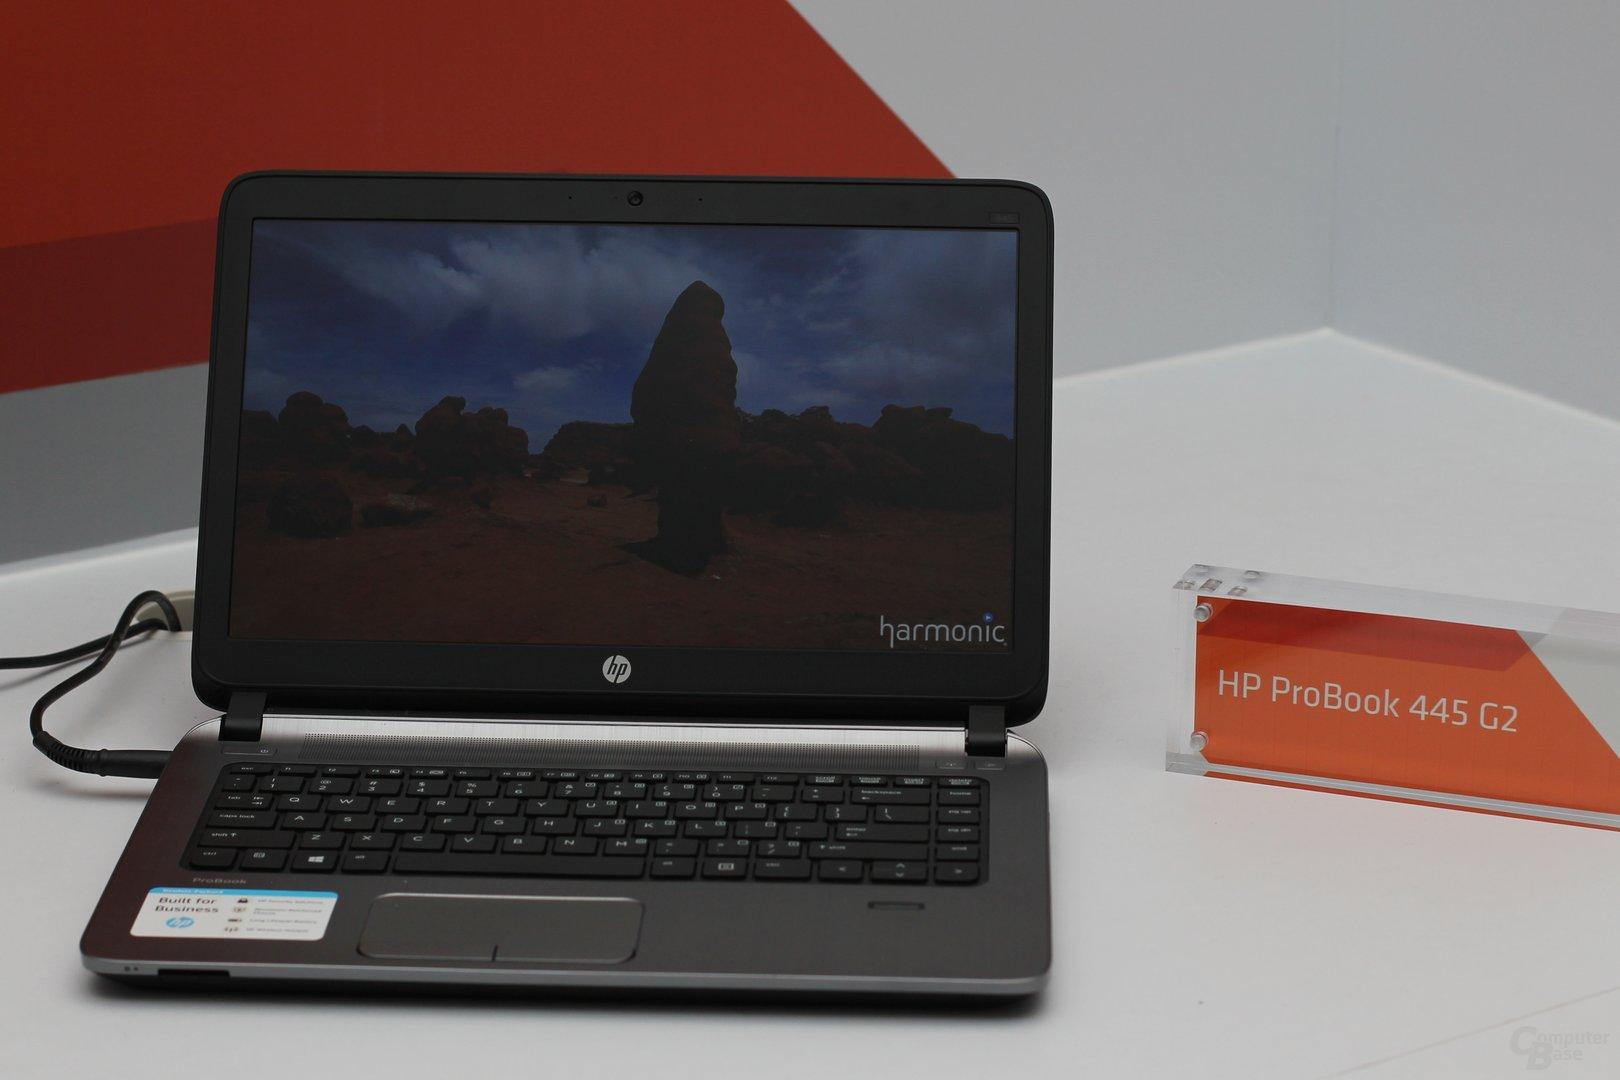 HP ProBook 445 G2 mit A6 Pro-7050B